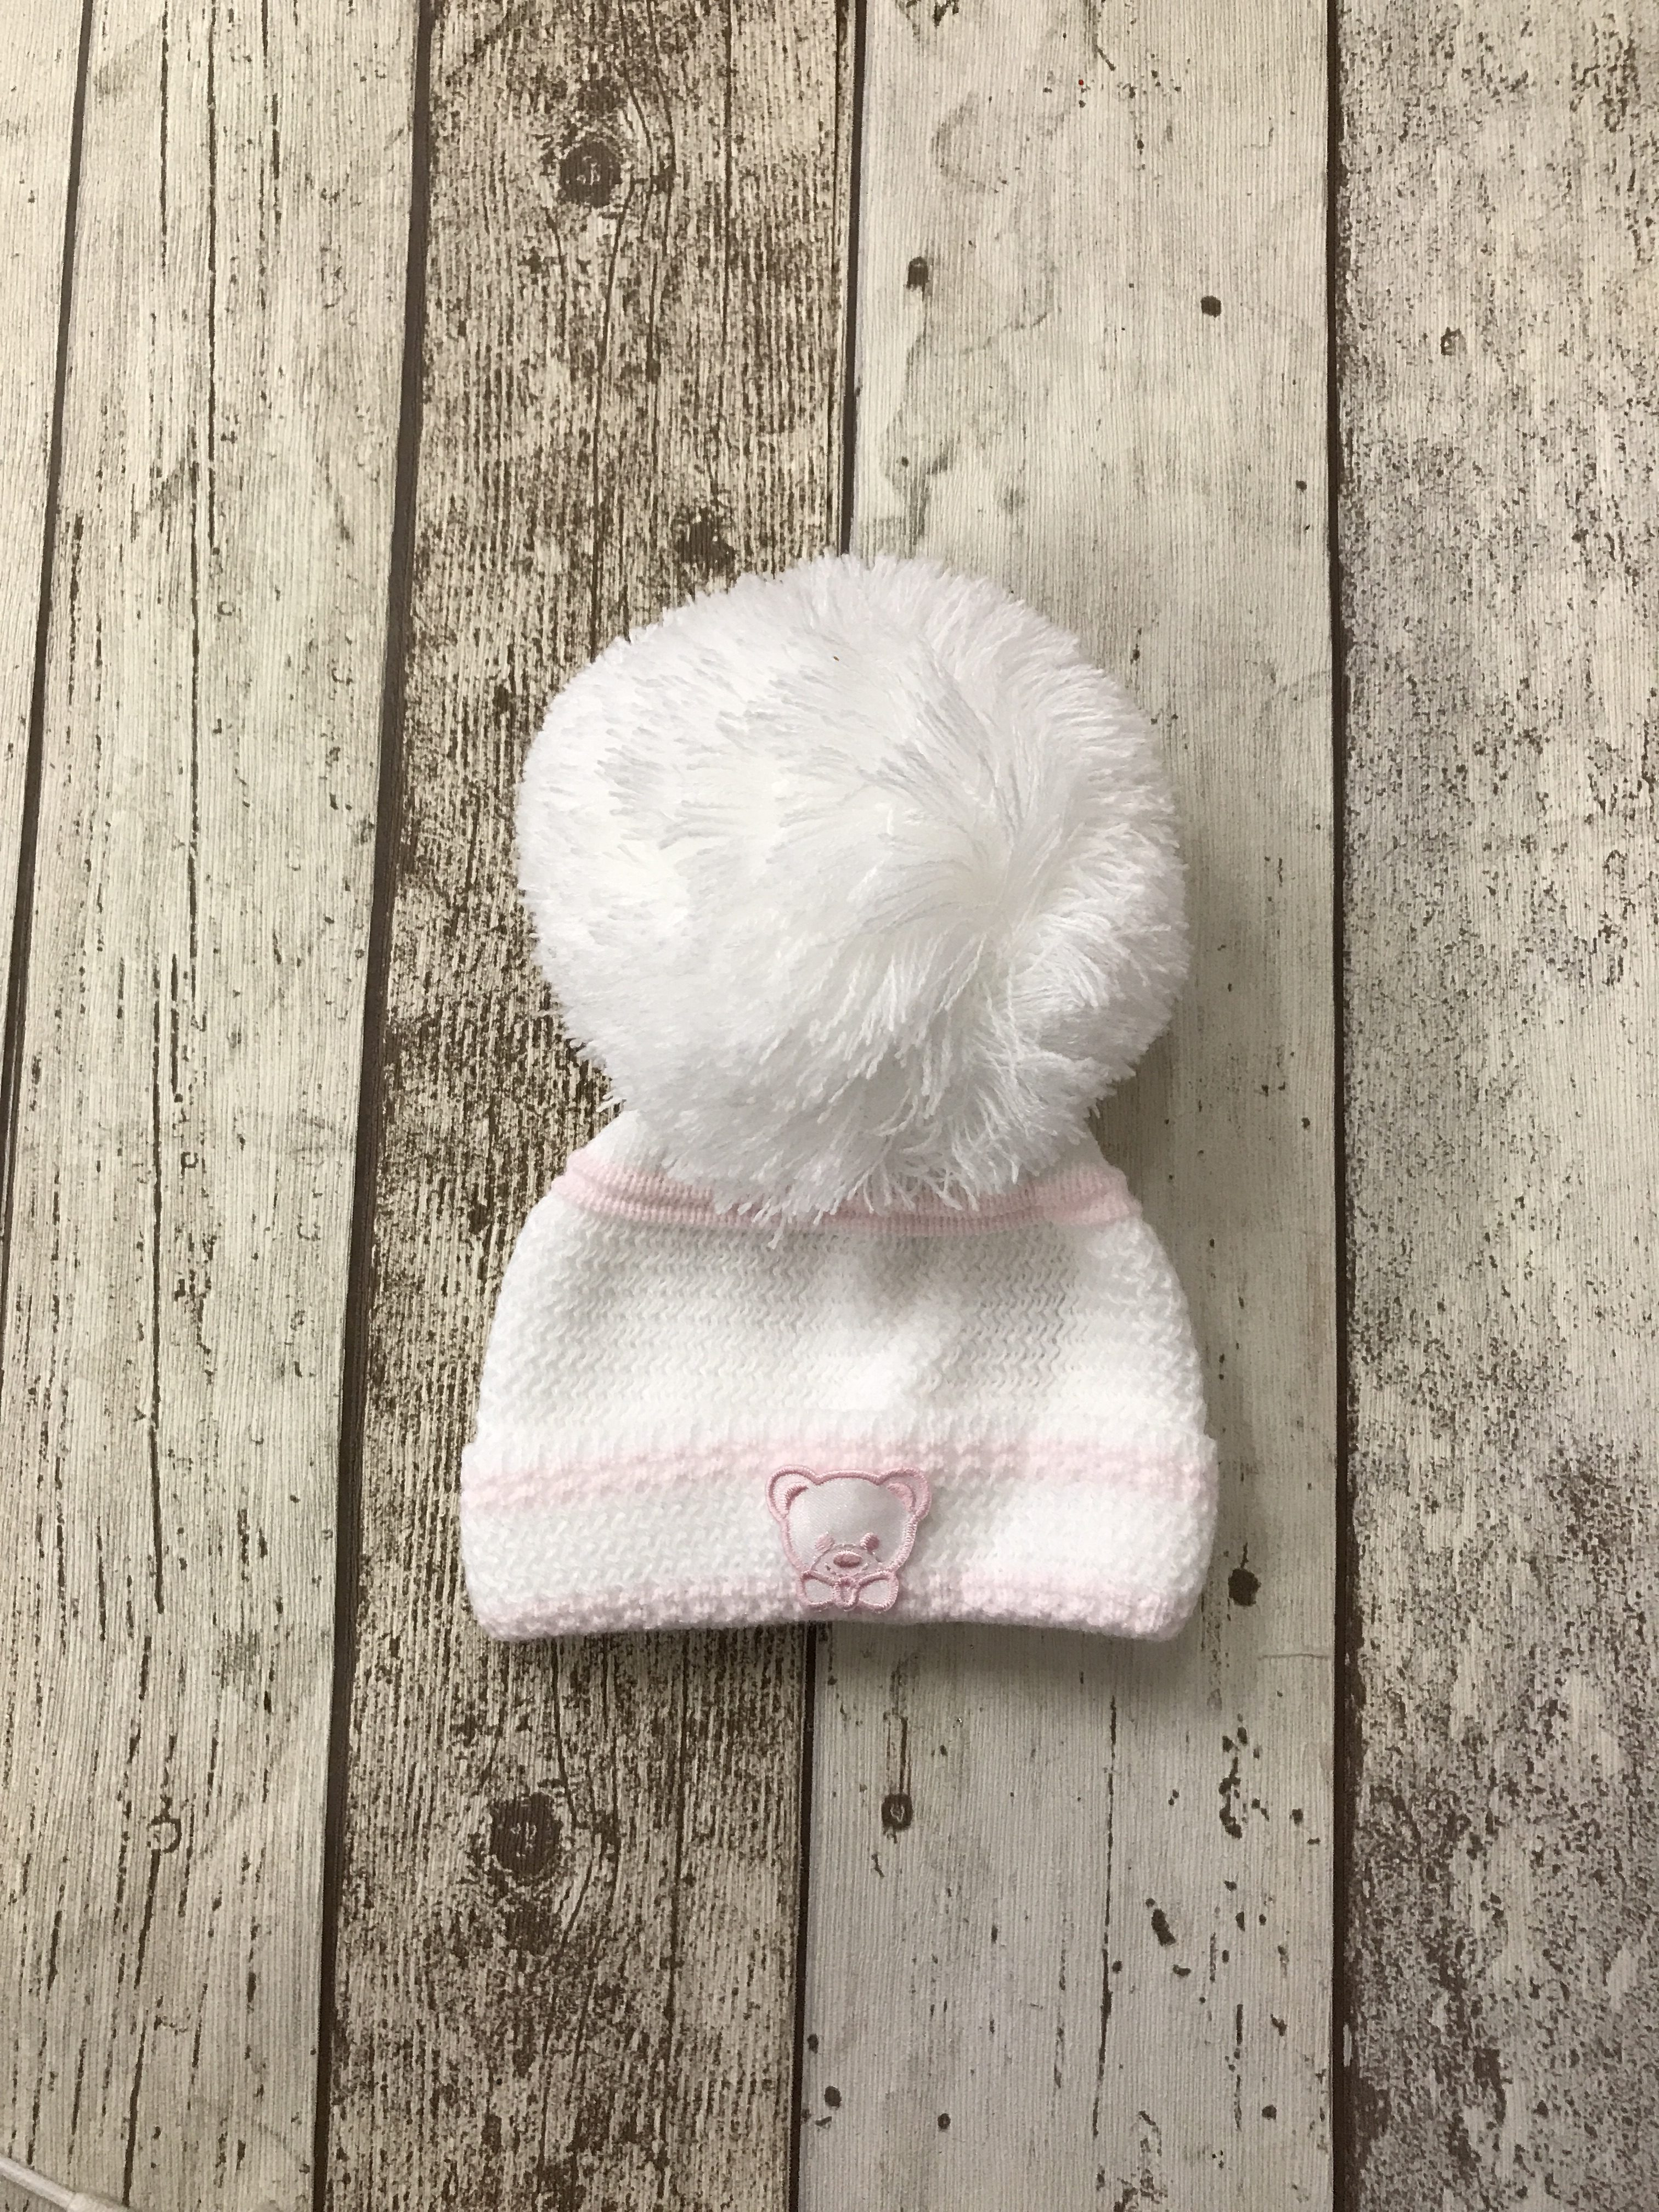 Spanish Teddy Bear PomPom Hat - Storky Baby and Childrenswear 533a9141671